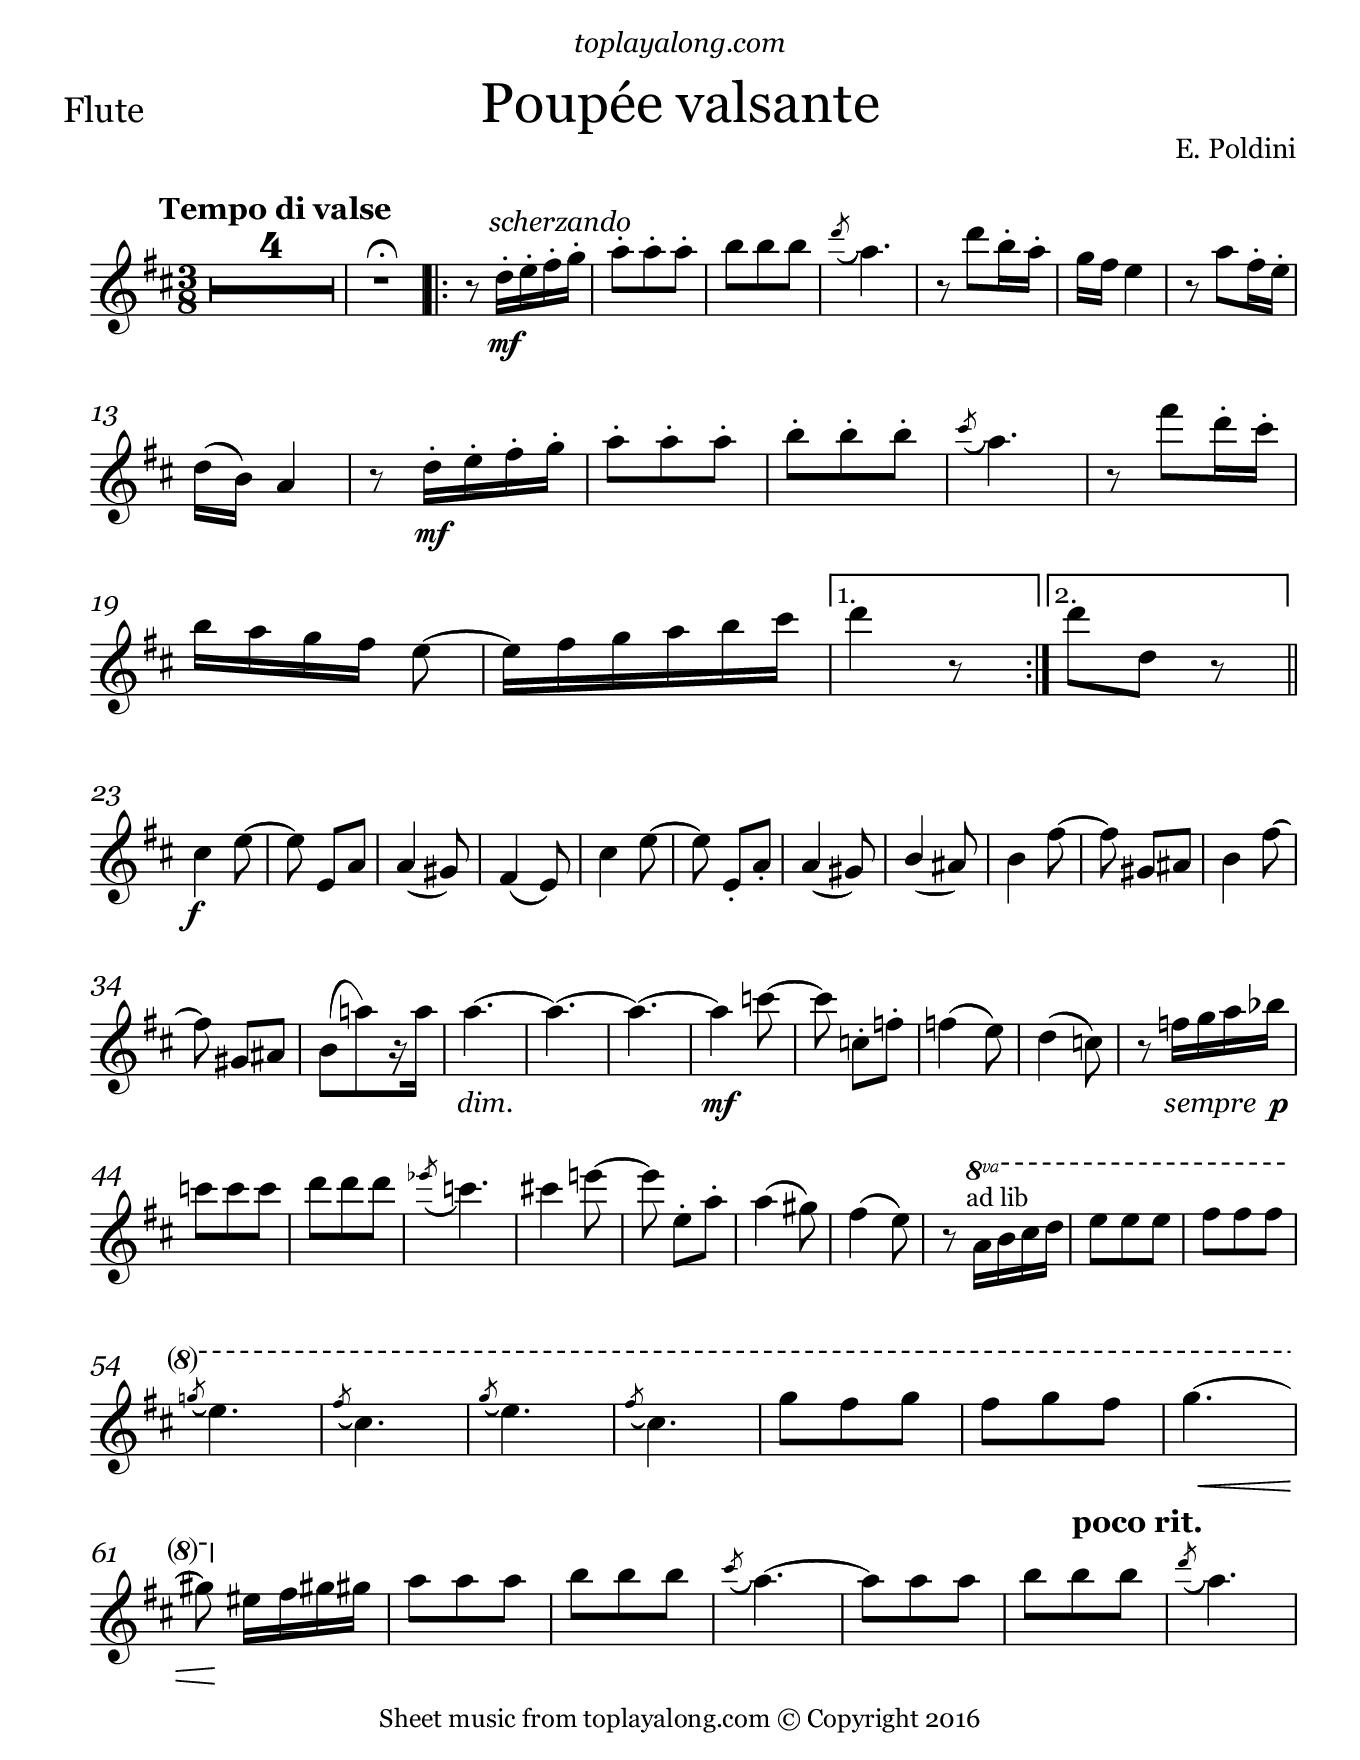 Poupée valsante by Poldini. Sheet music for Flute, page 1.